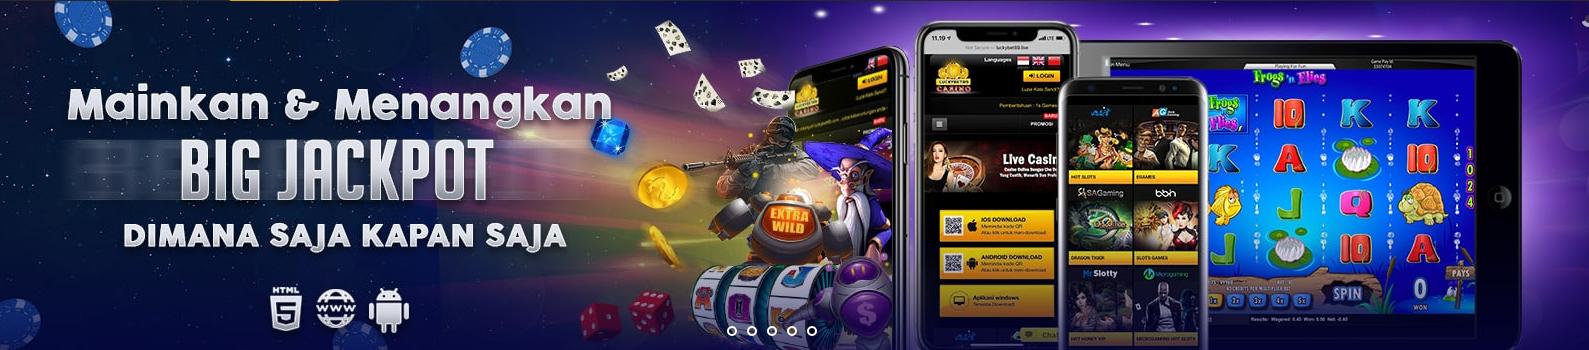 Cara Jackpot Slot Online dan Bantai Bandar Judi